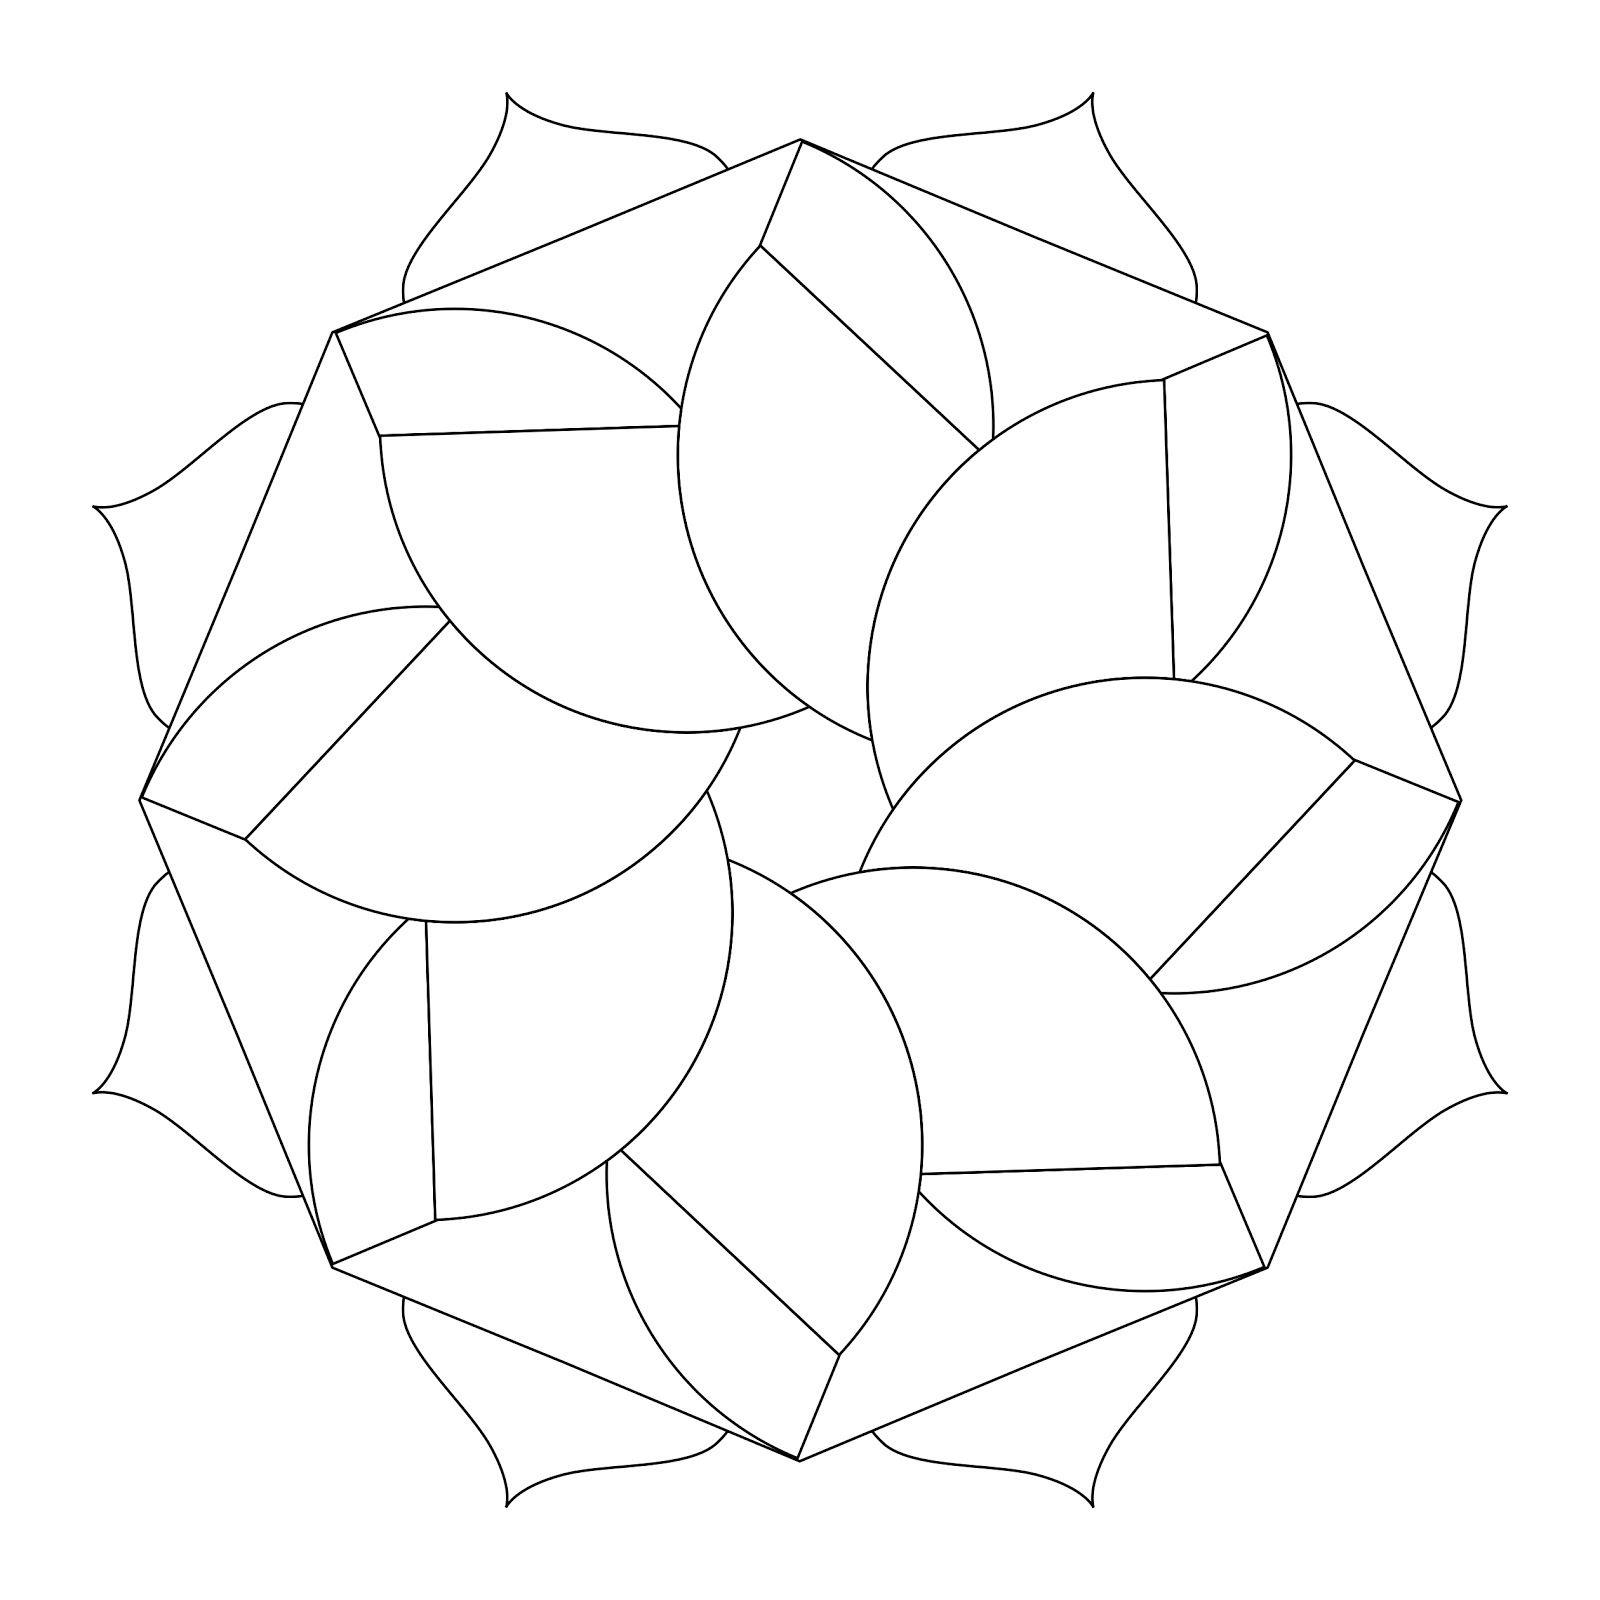 pattern   Arte   Pinterest   Mandalas, Patrones y Molde